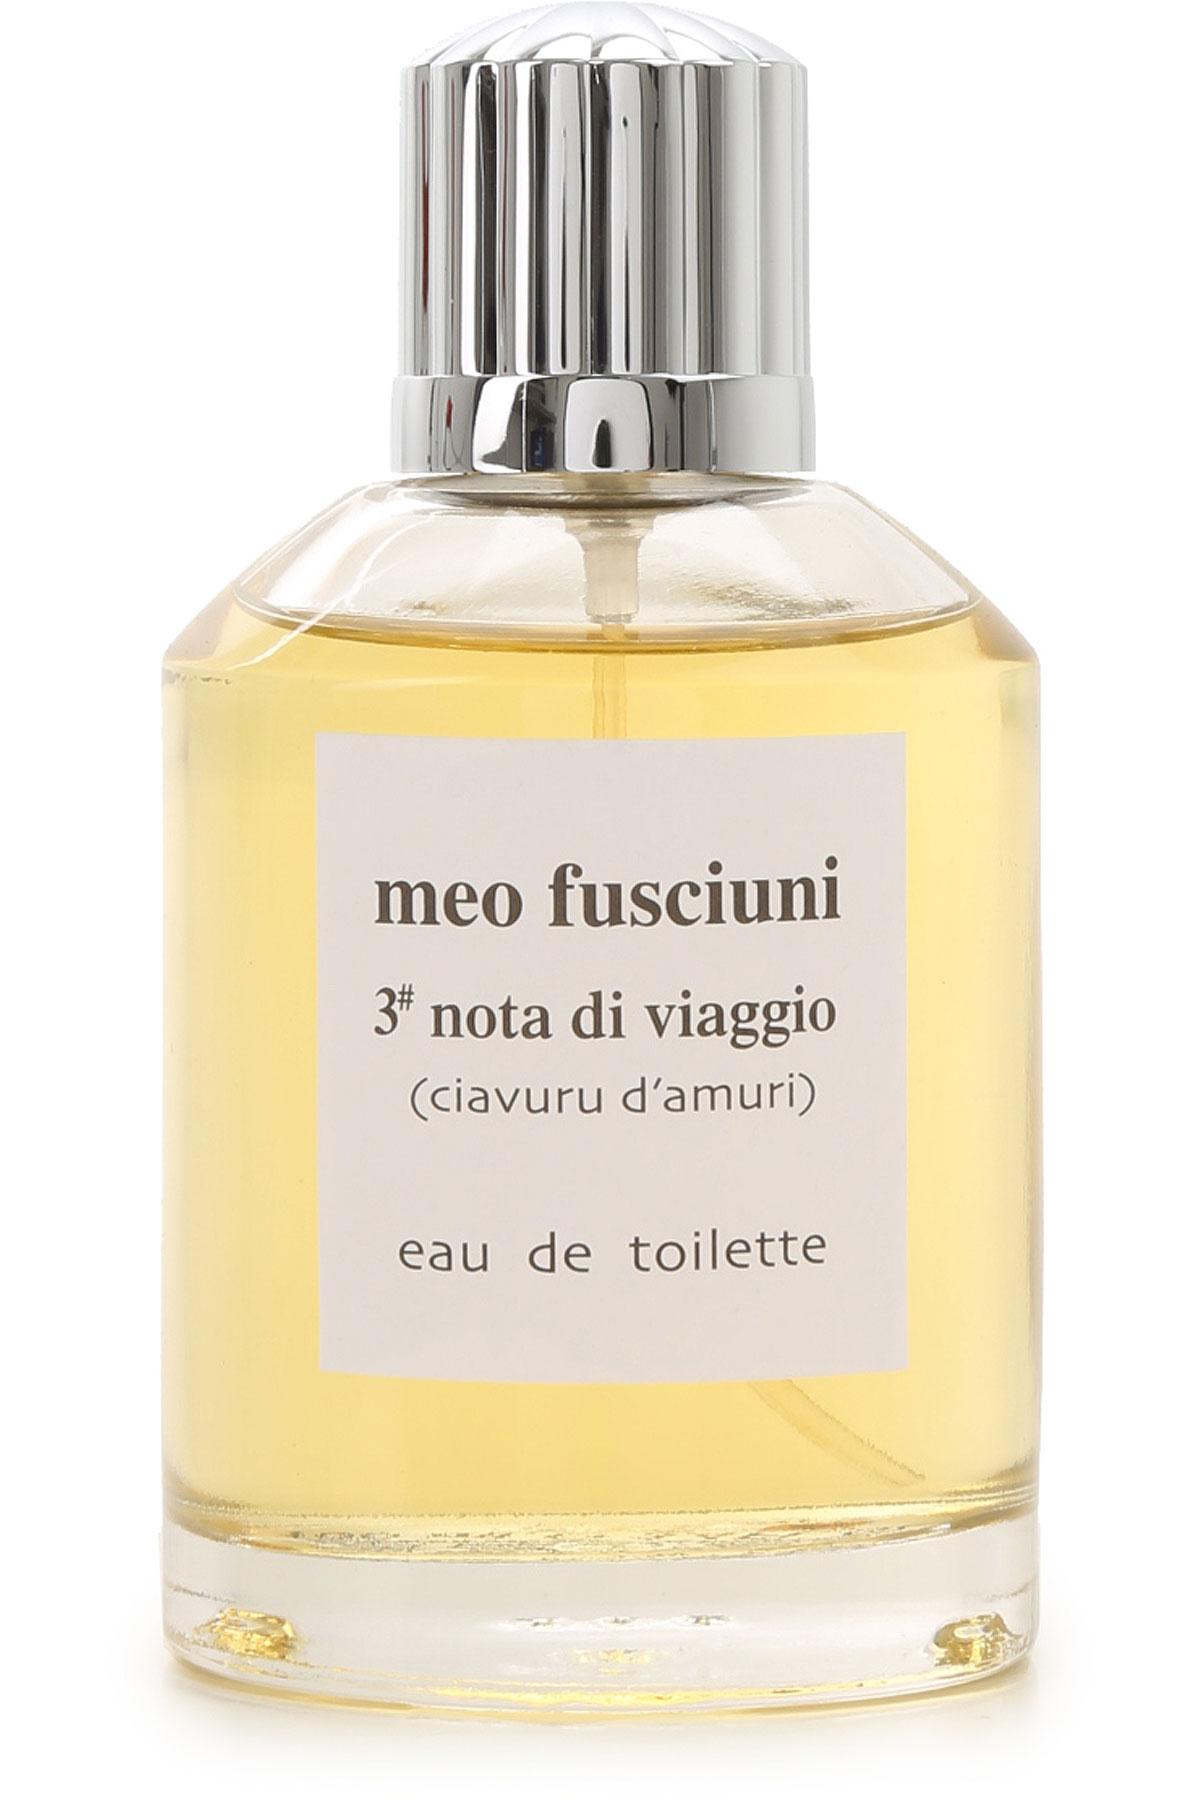 Meo Fusciuni Fragrances for Men, 3 Nota Di Viaggio - Eau De Toilette - 100 Ml, 2019, 100 ml